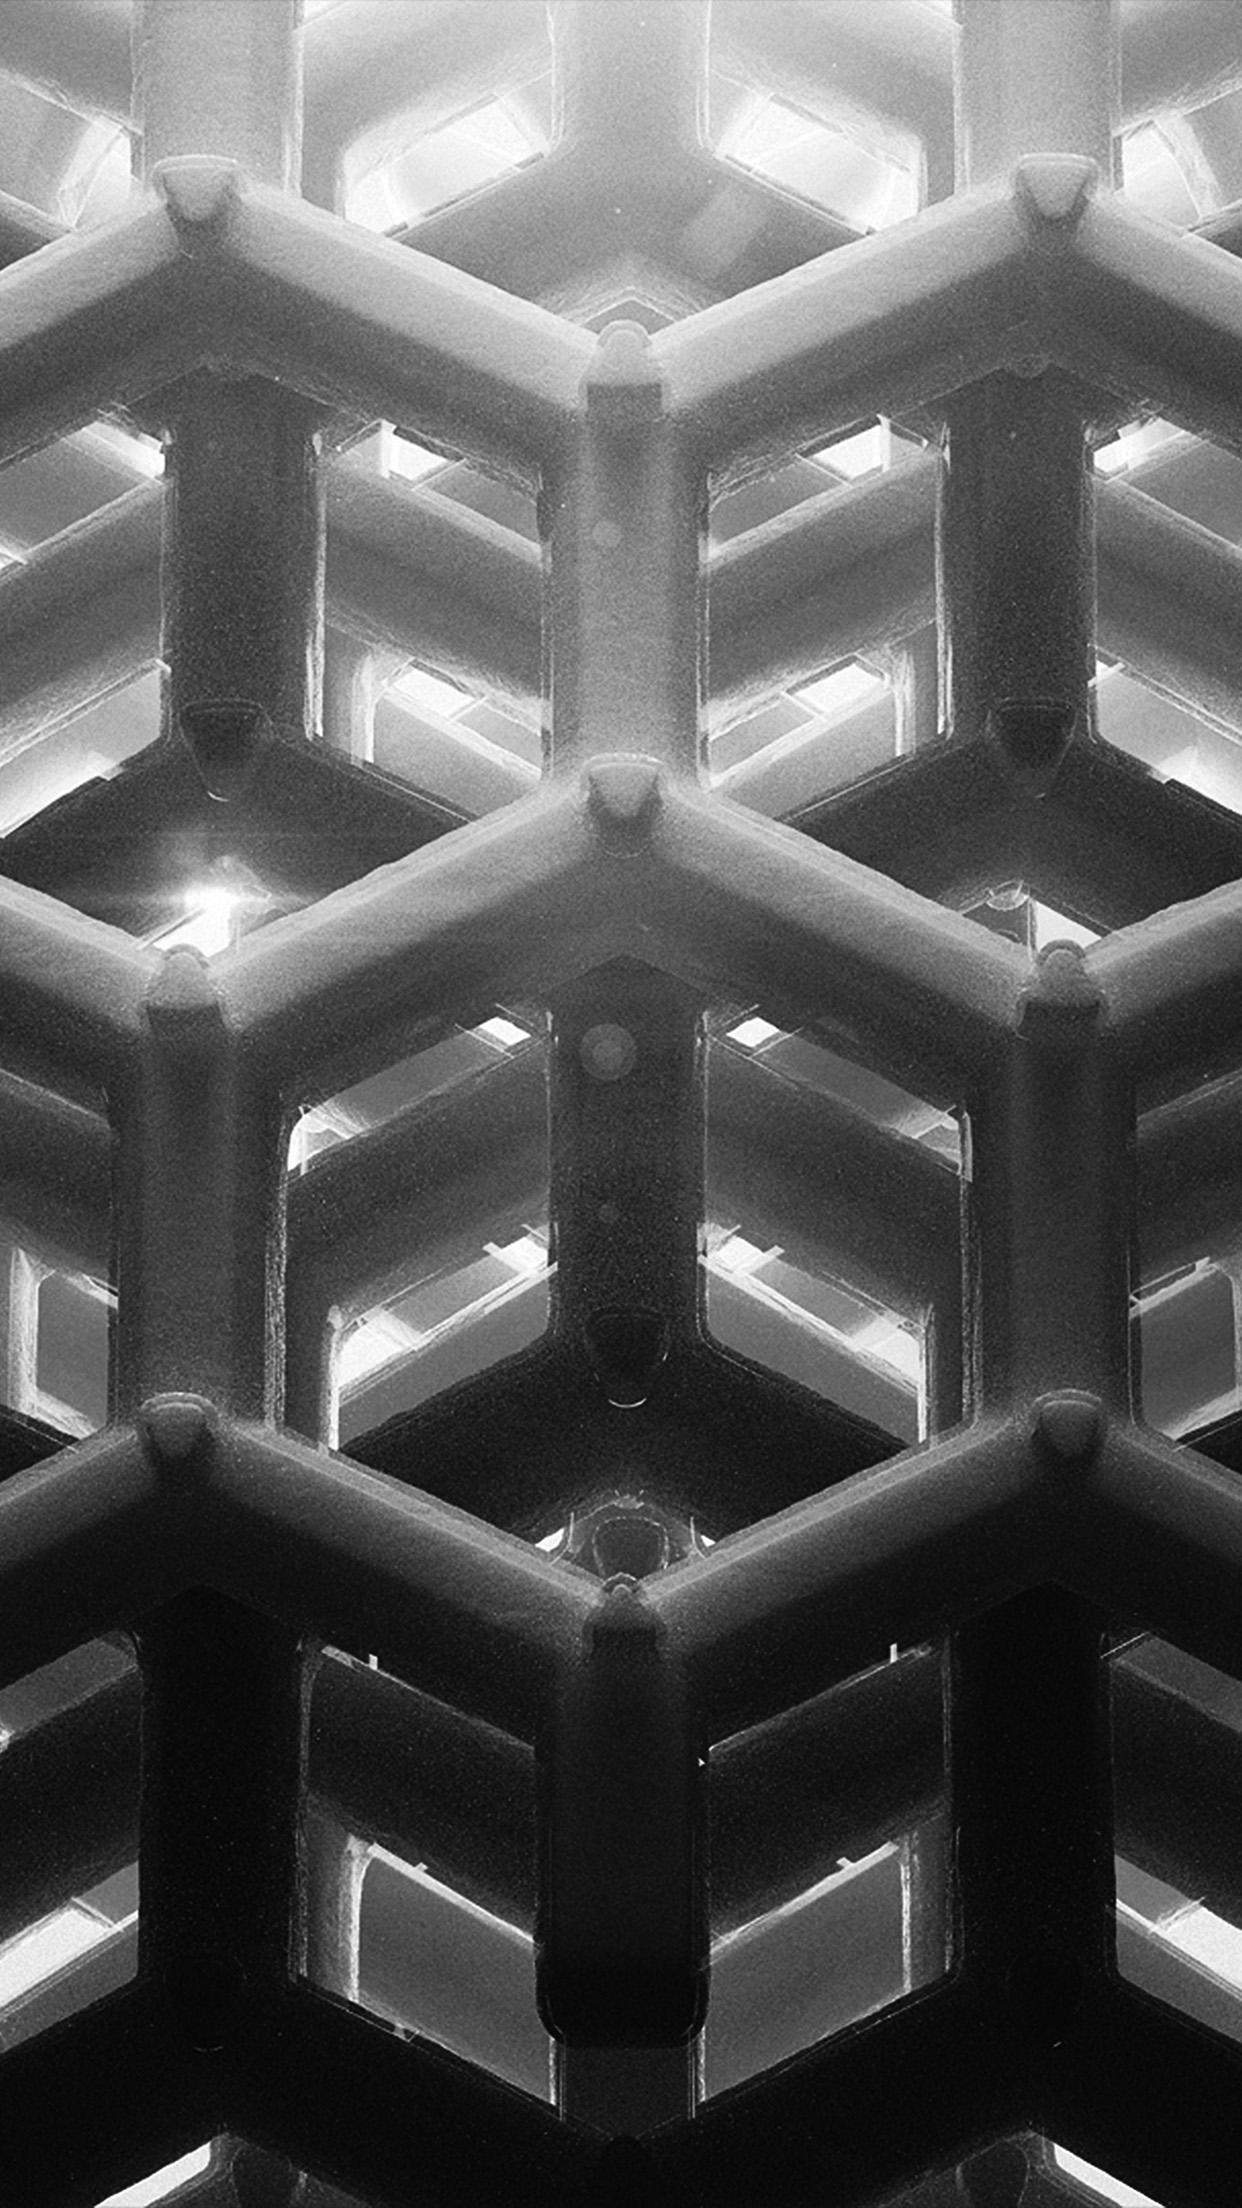 vp91honey-cube-pattern-comb-dark-bw-wallpaper